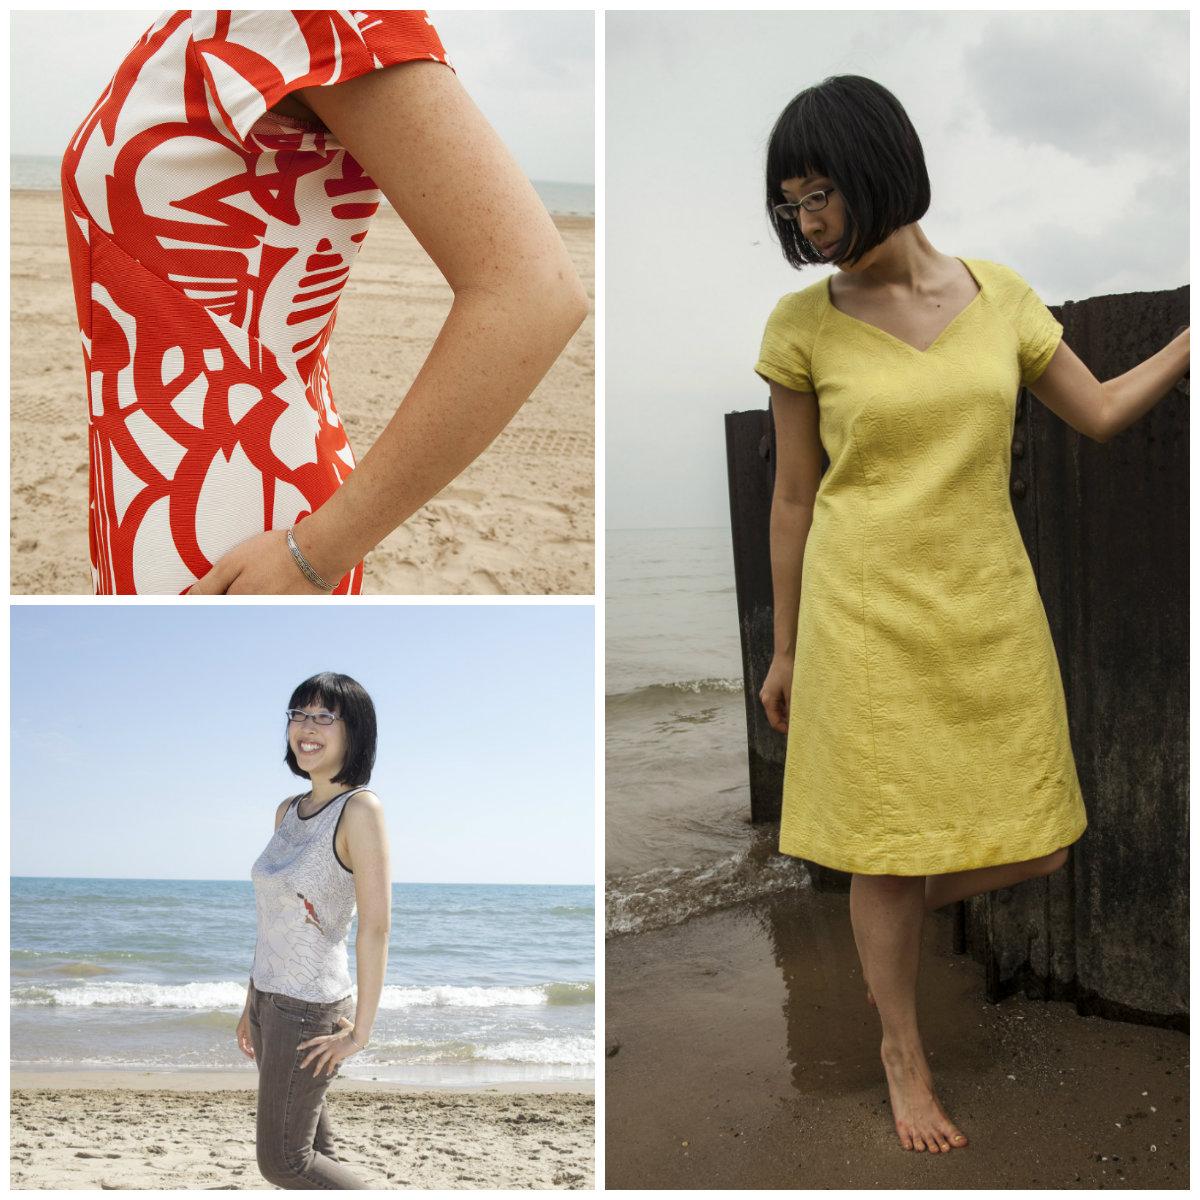 Seamster Patterns Dandelion dress & top Downloadable Pattern 1401